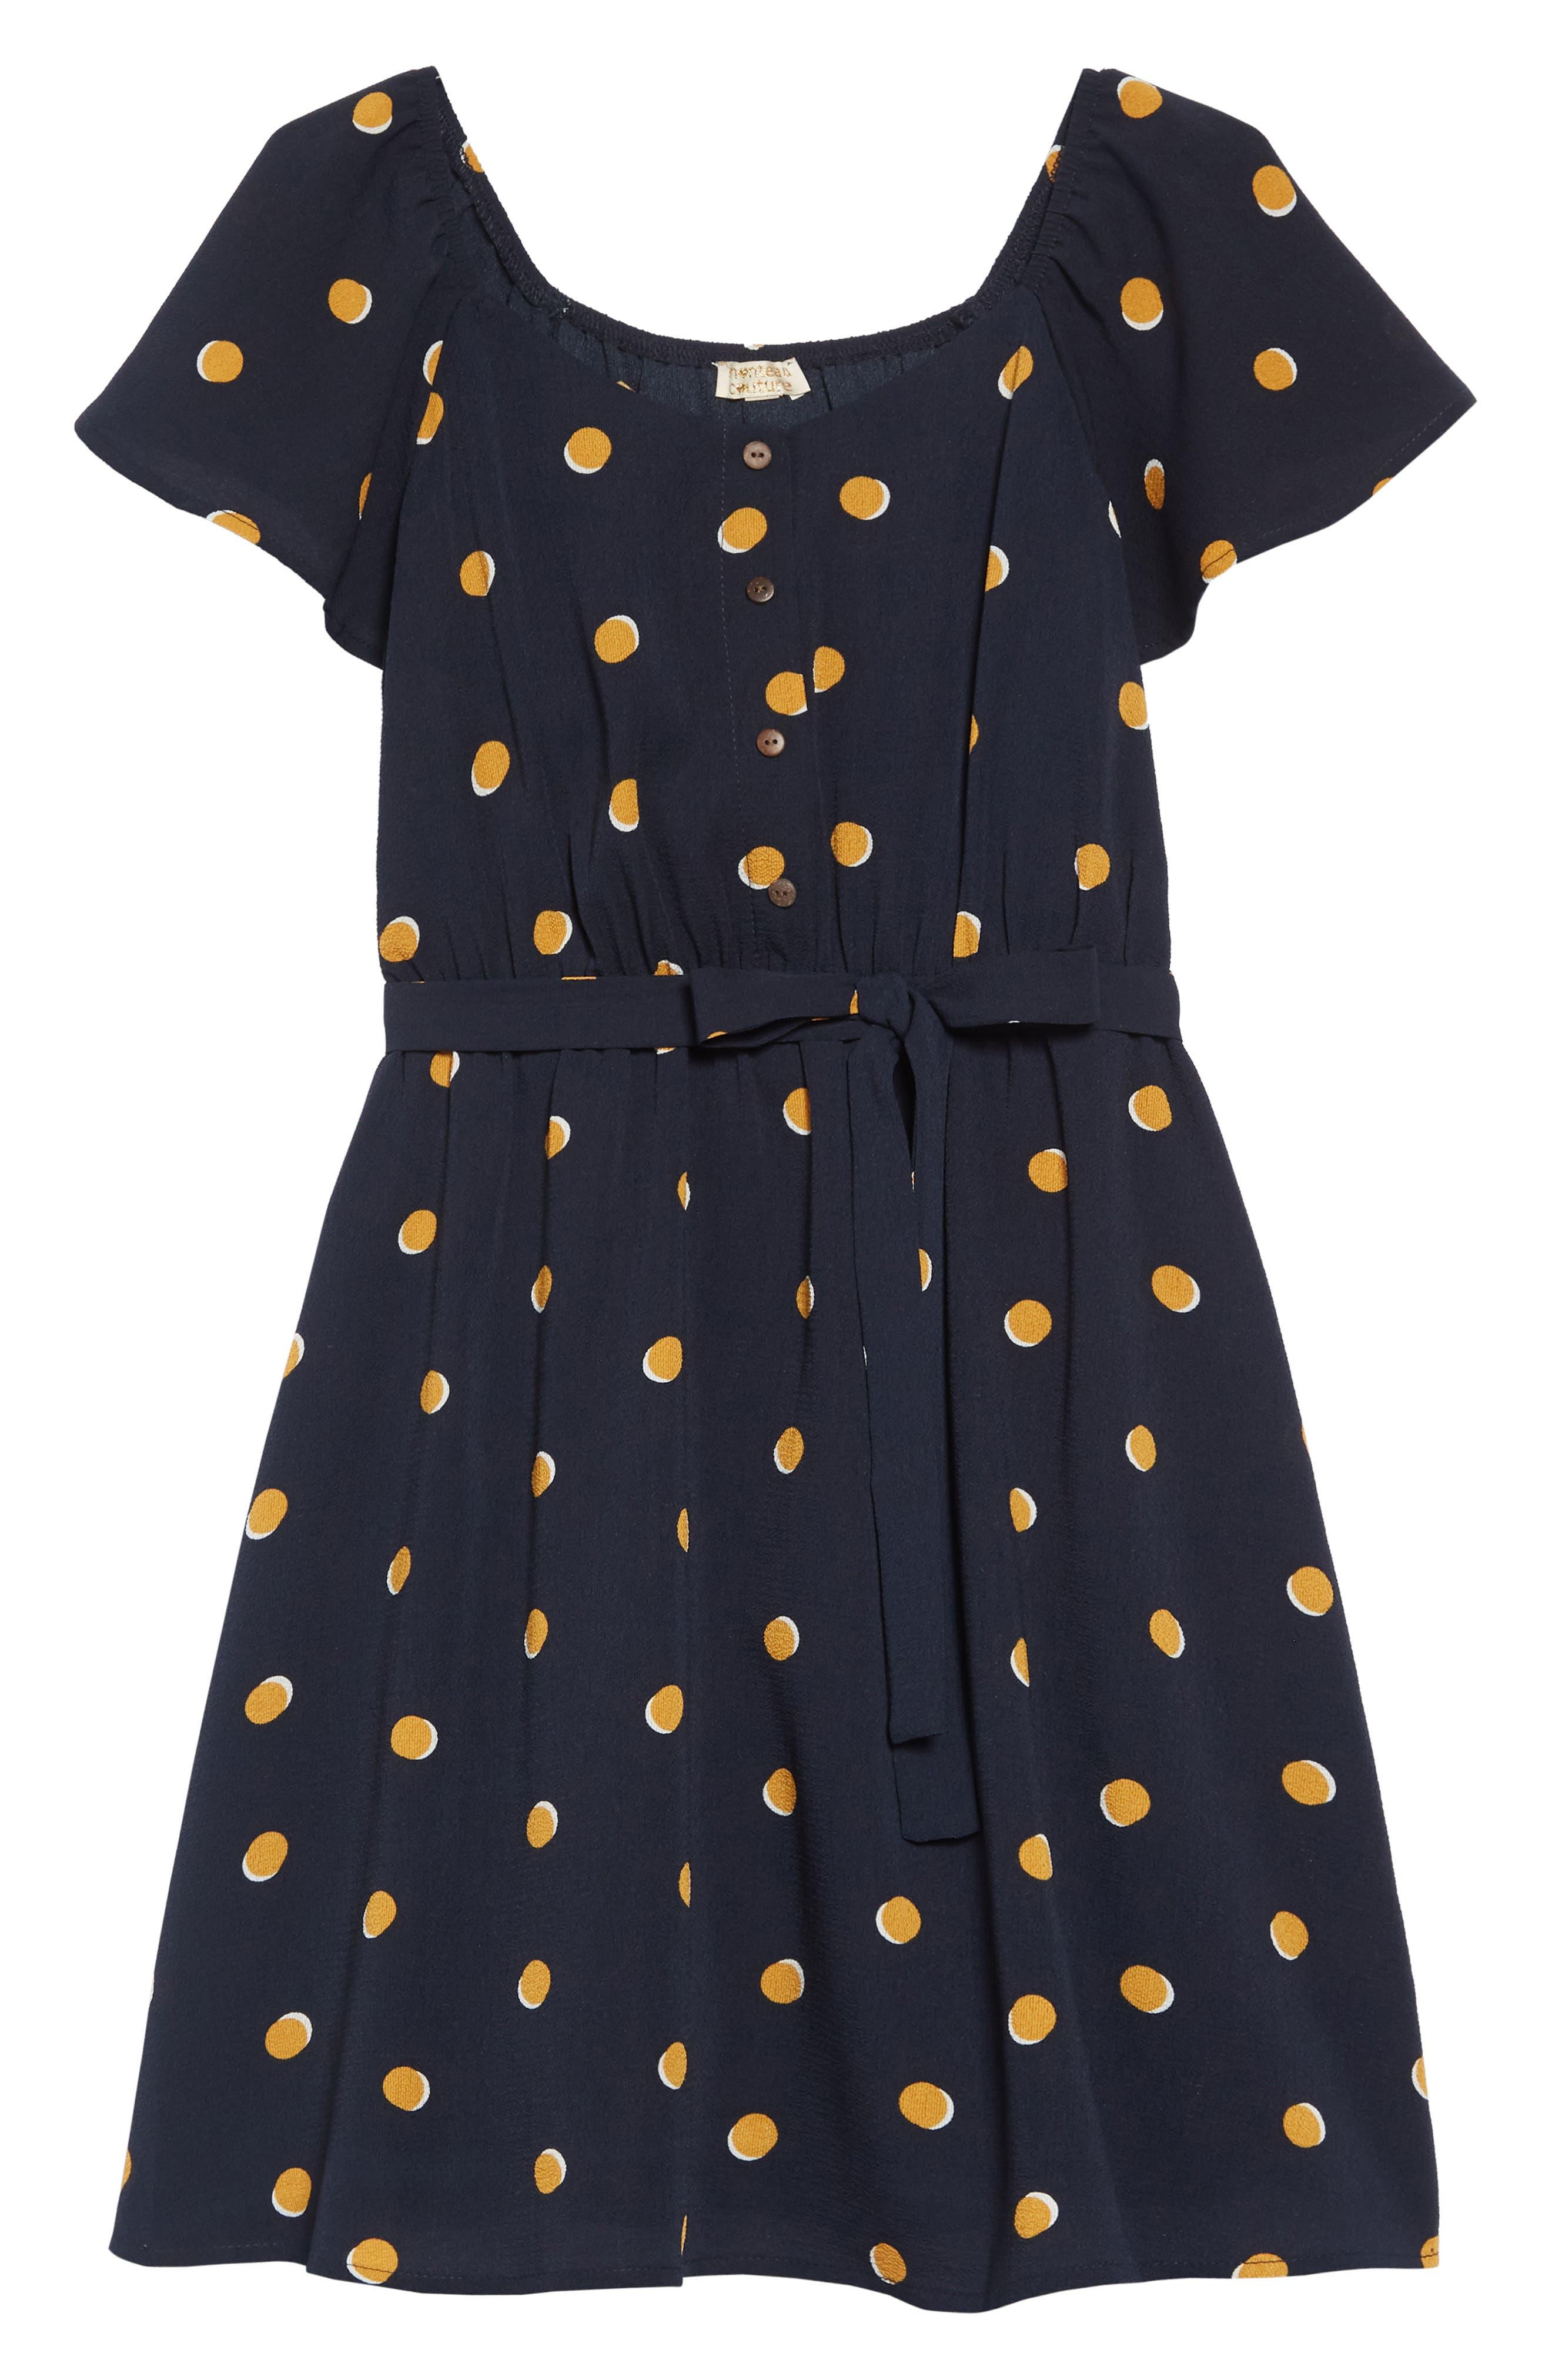 Polka Dot Flutter Sleeve Dress,                             Main thumbnail 1, color,                             NAVY/MUSTARD